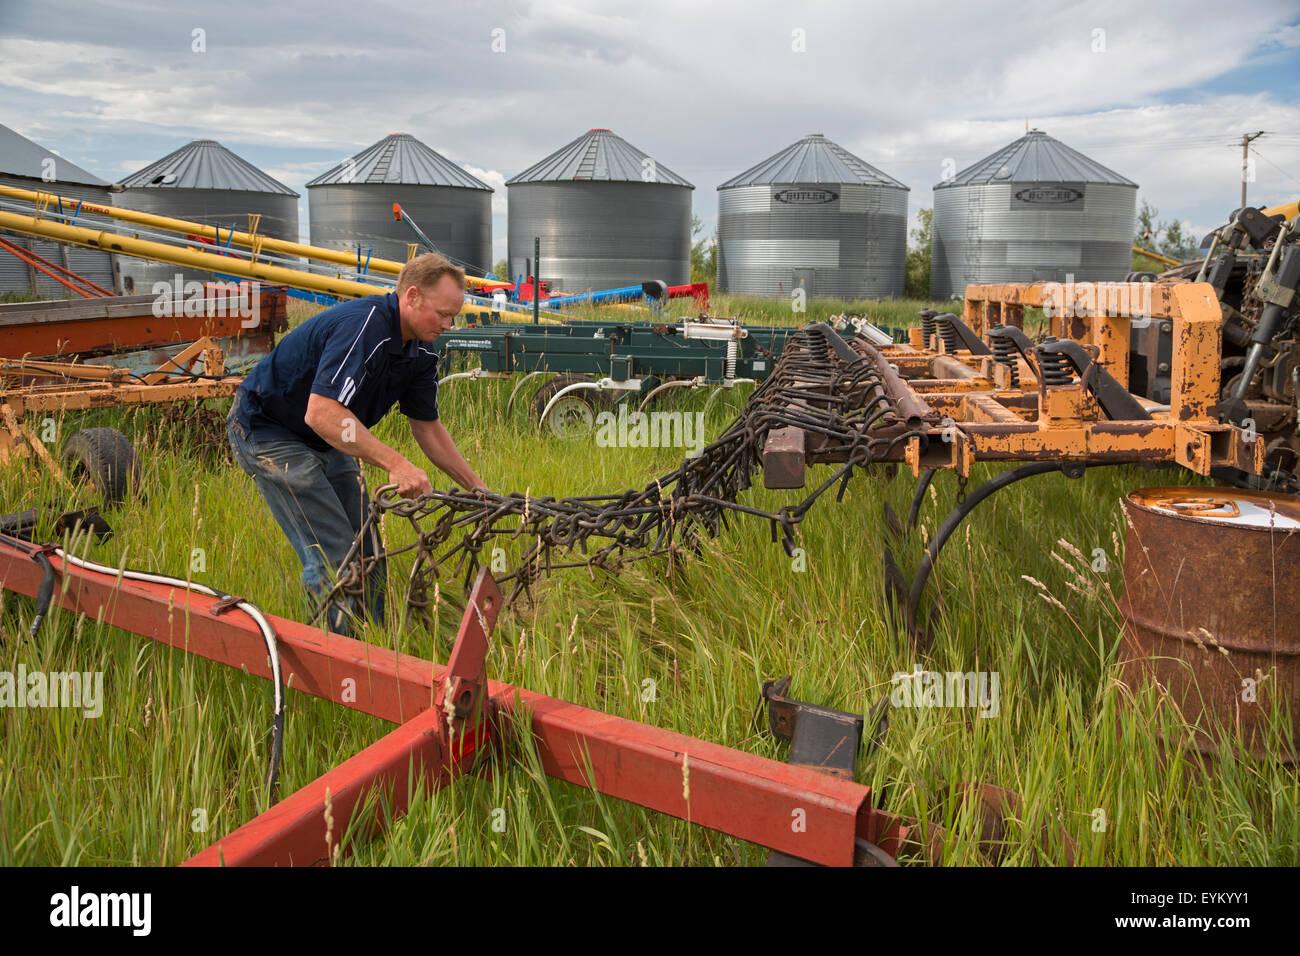 Driggs, Idaho - Wyatt Penfold handles equipment on his farm, where he grows seed potatoes. - Stock Image